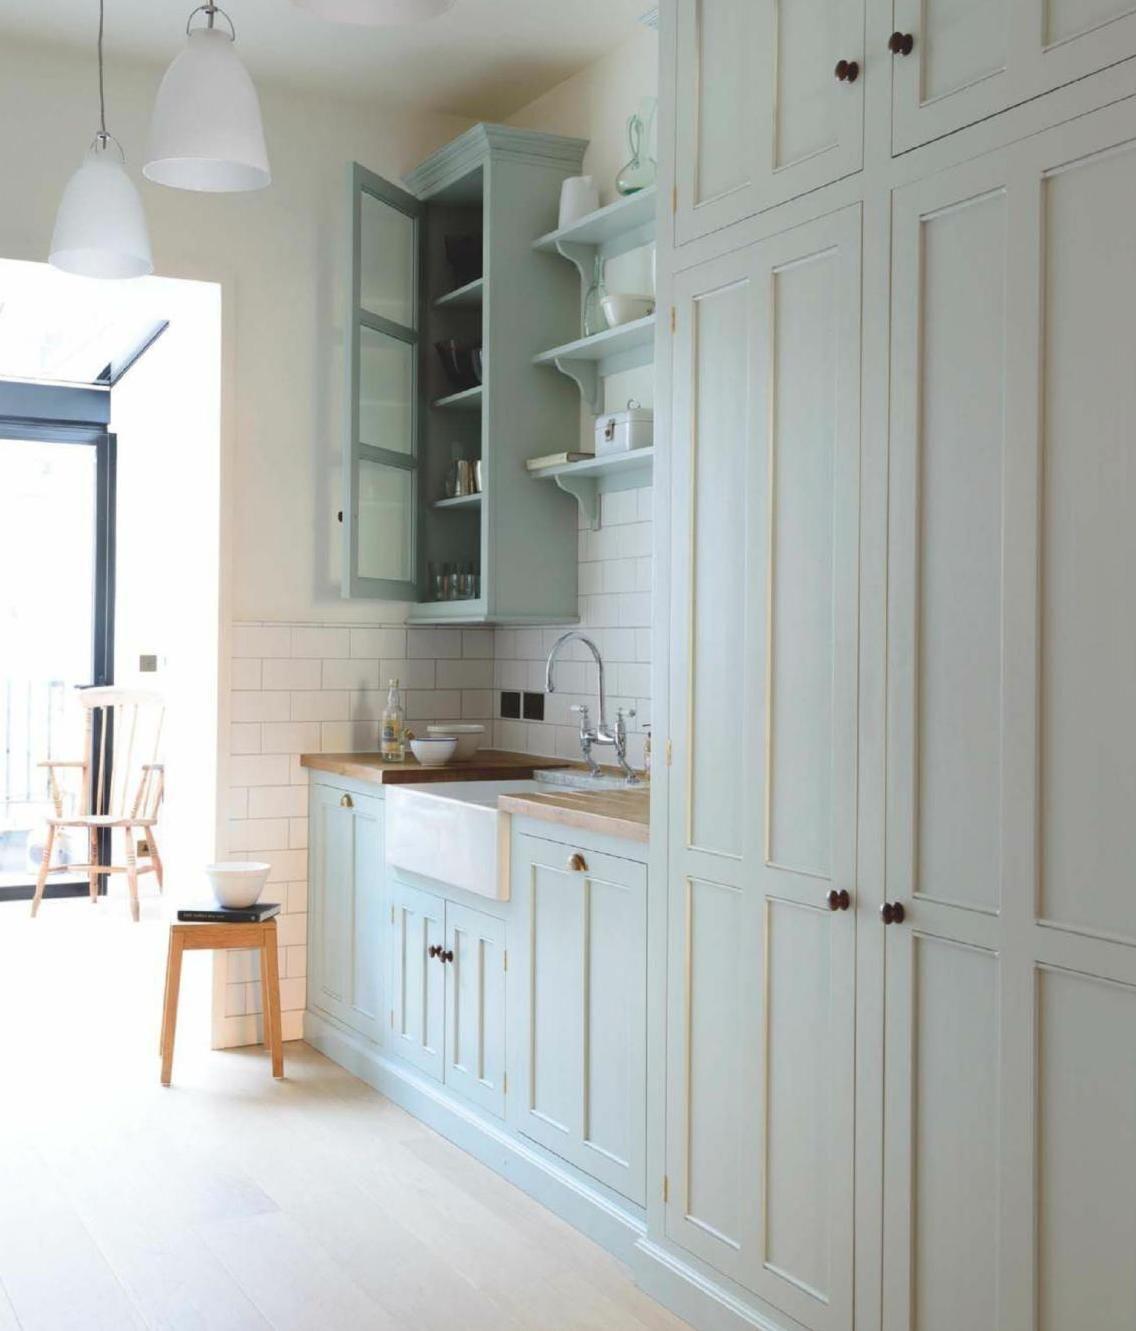 Pale Green Kitchen Units: Very Pale Green Kitchen